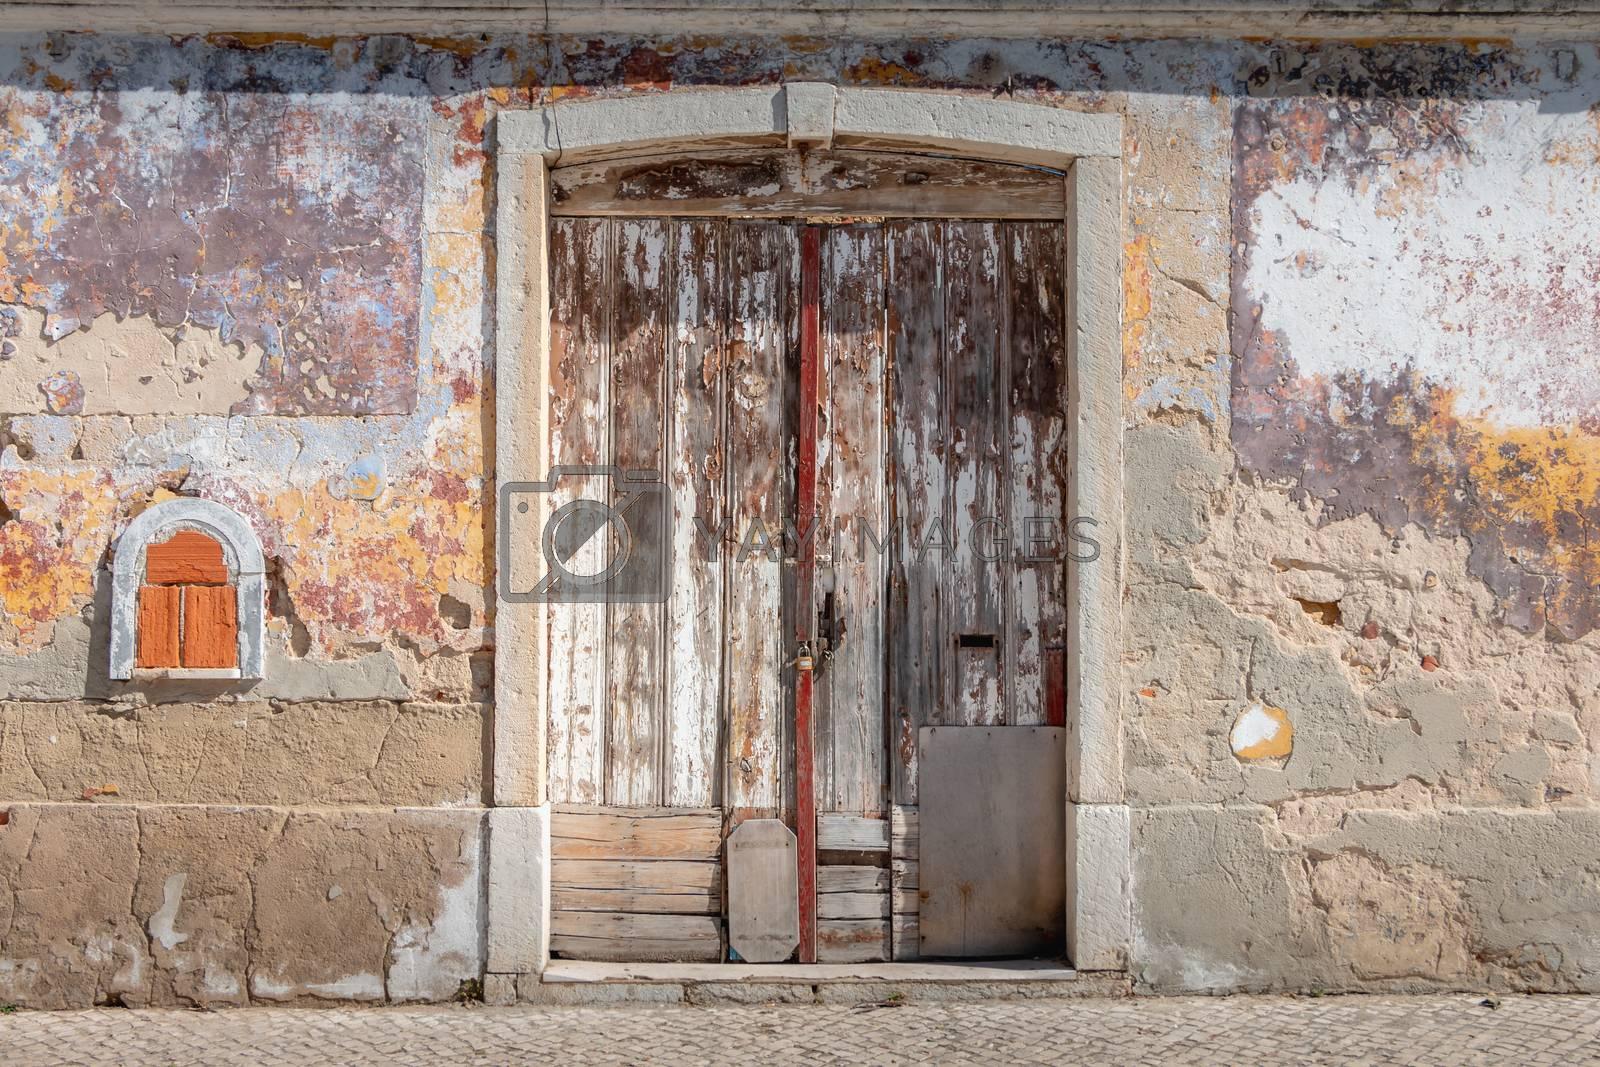 very old worn wooden door with peeling paint in portugal